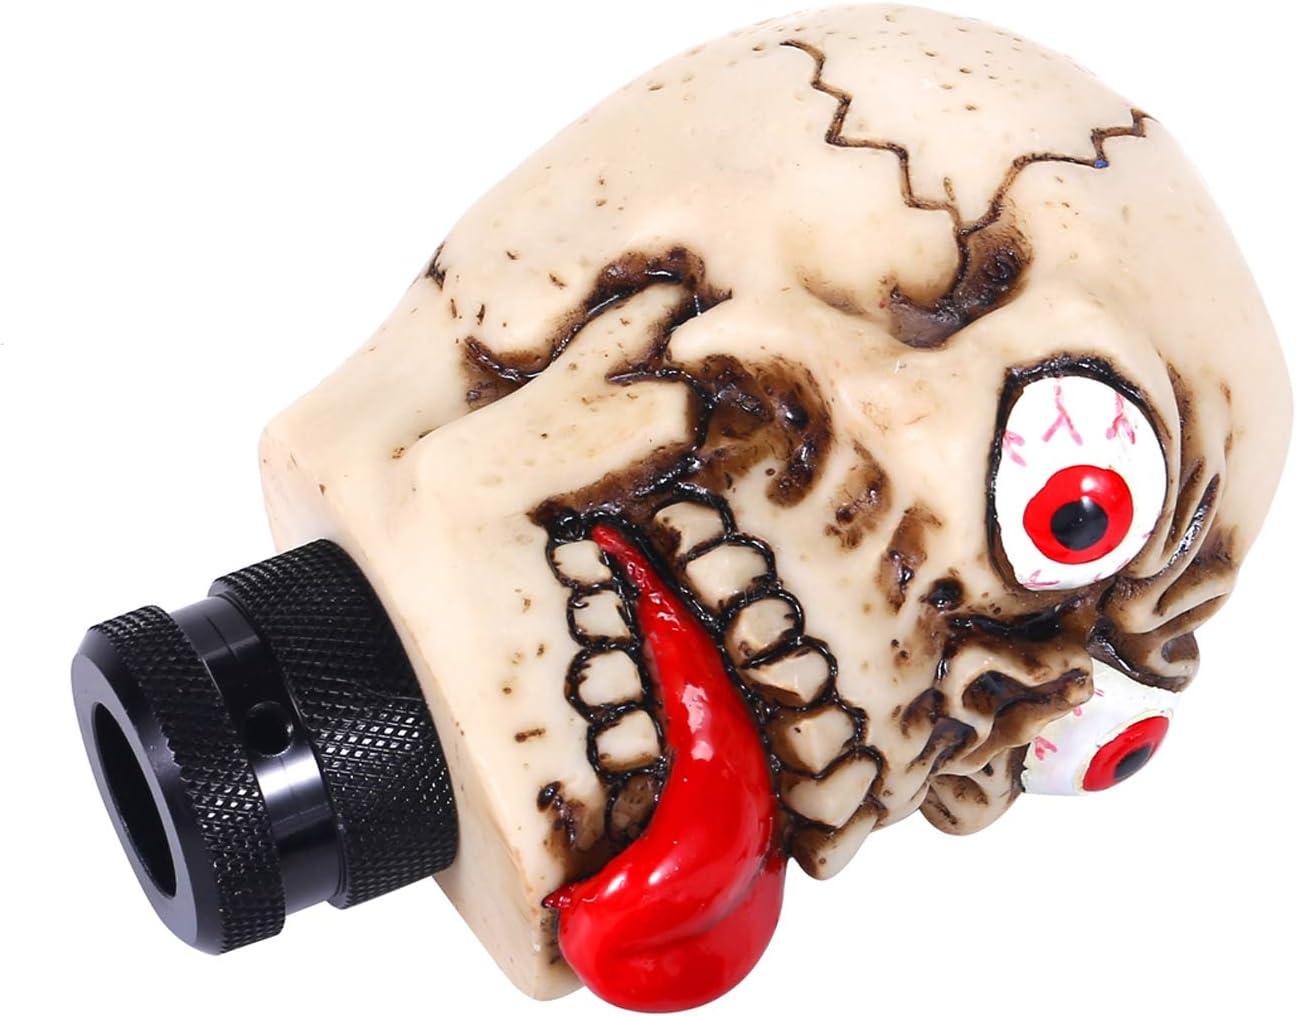 Beige Bashineng Car Auto Gear Stick Shift Knob Big Tongue Skull Transmission Shifter Knobs Head Fit Most Automatic Manual Vehicle